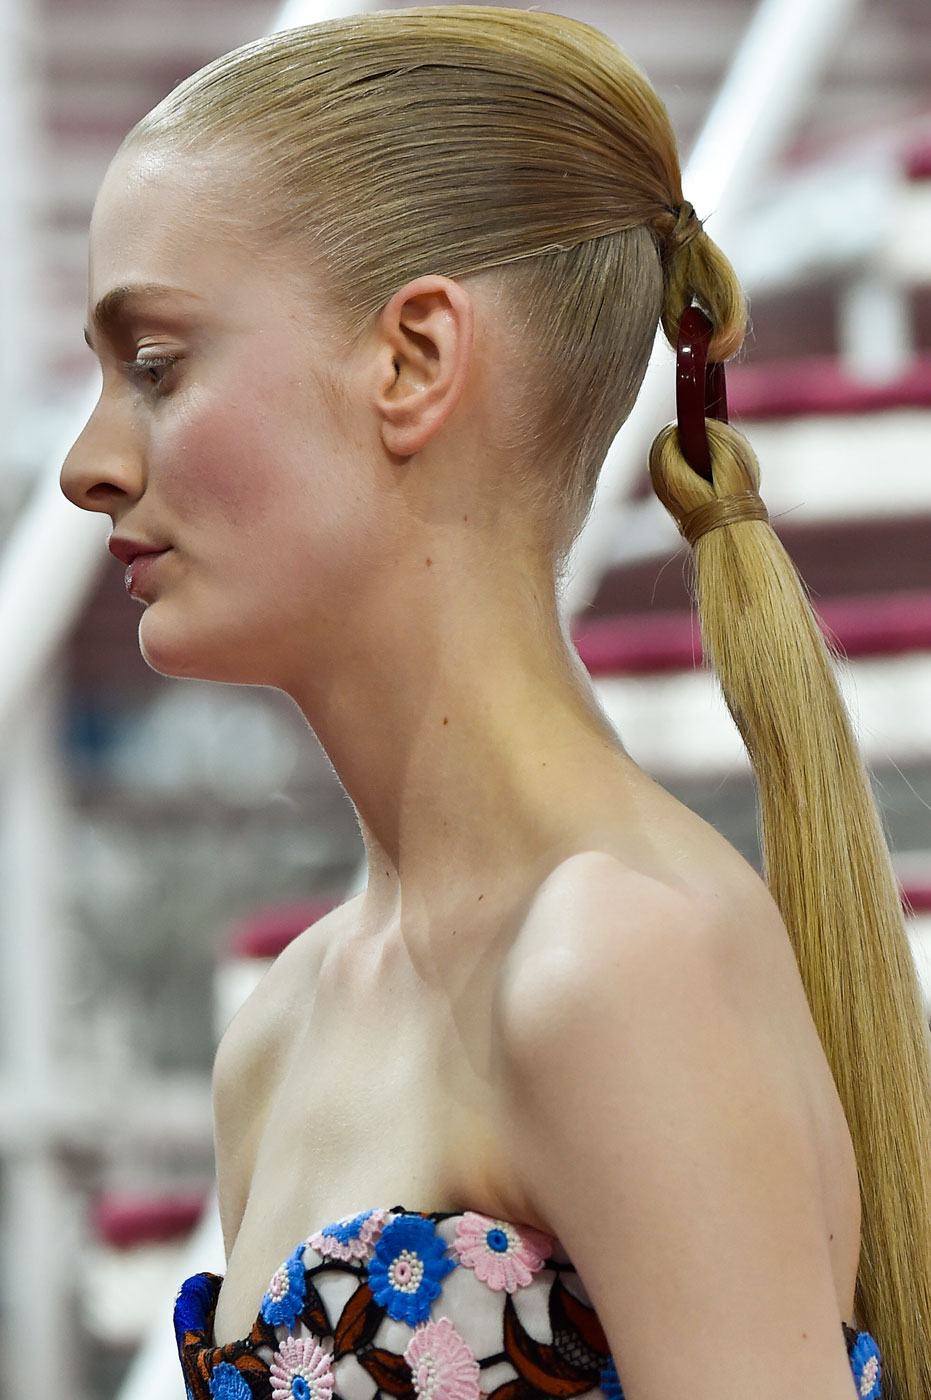 Christian-Dior-fashion-runway-show-close-ups-haute-couture-paris-spring-summer-2015-the-impression-102